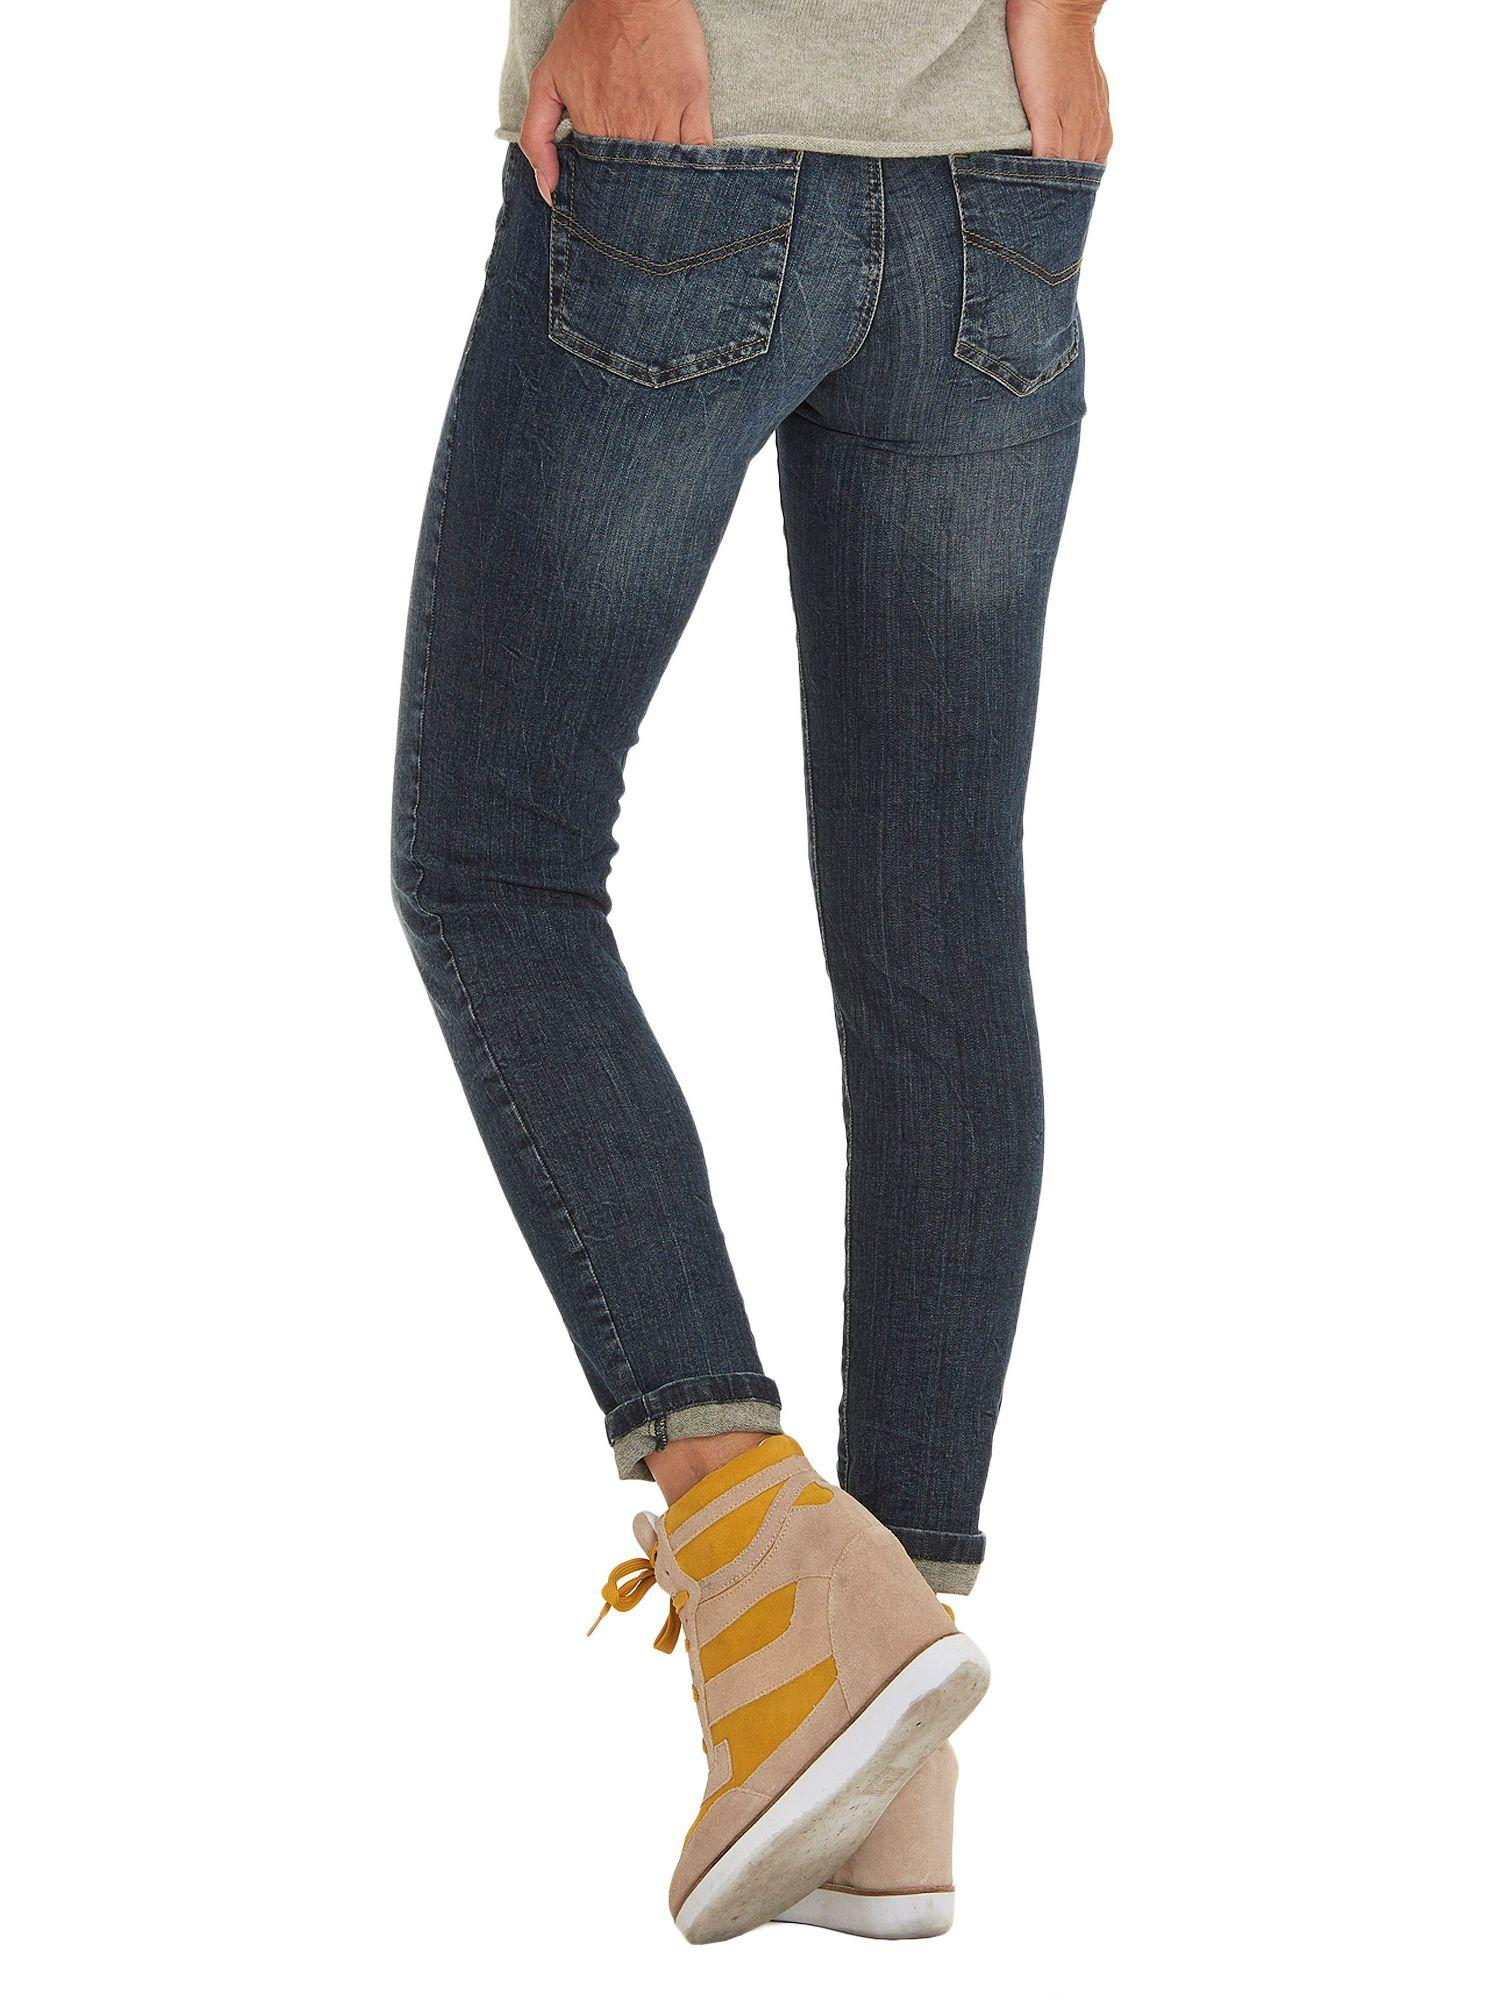 Betty & Co. Denim Easy Fit Five Pocket Jeans in Dark Blue Denim (Blue)